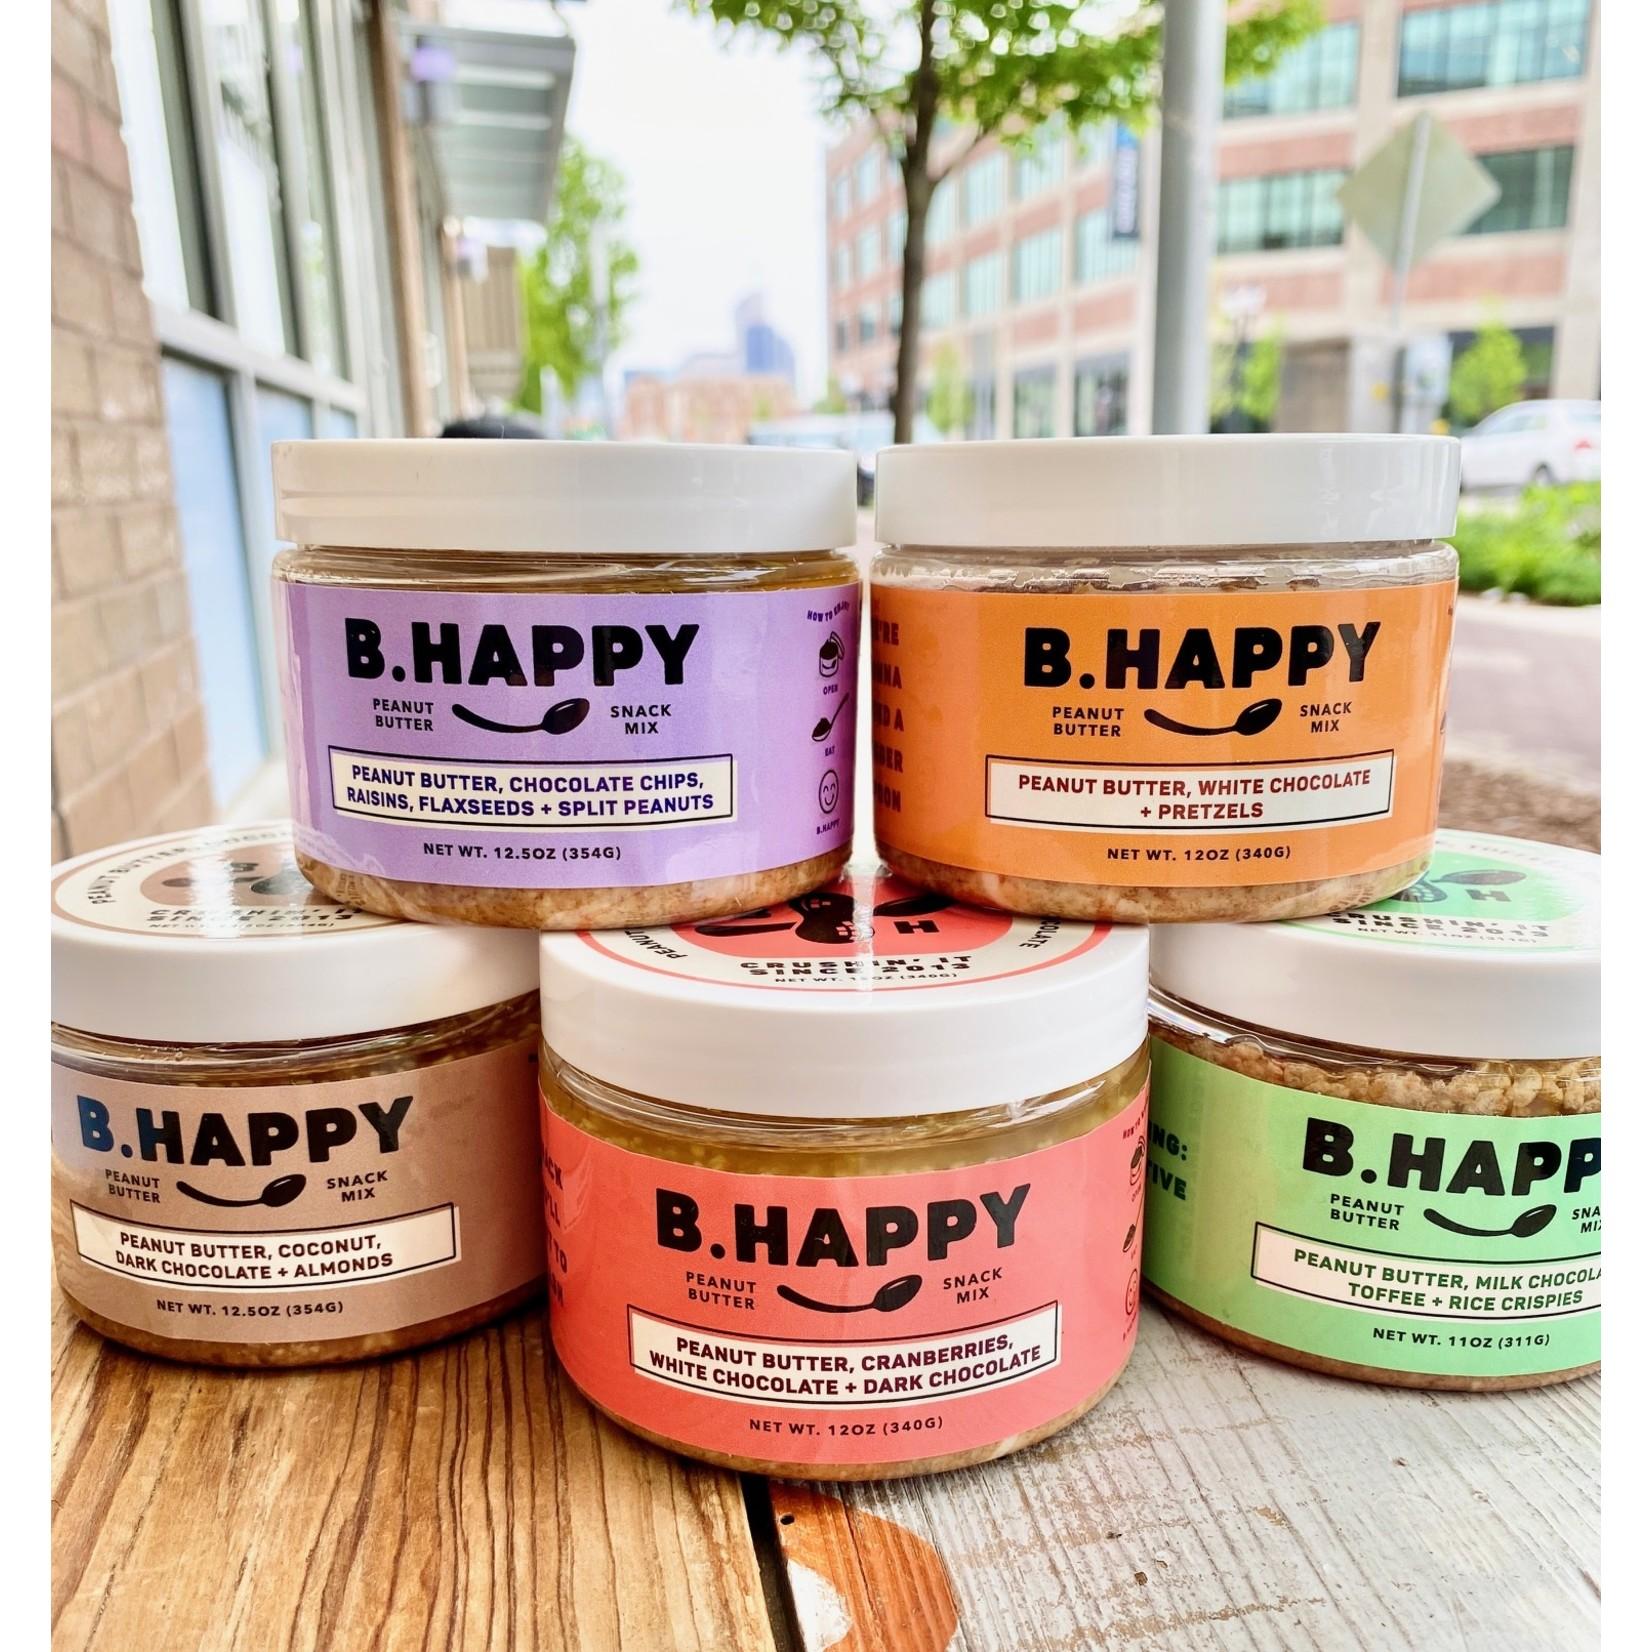 B. Happy Peanut Butter B. Happy Peanut Butters